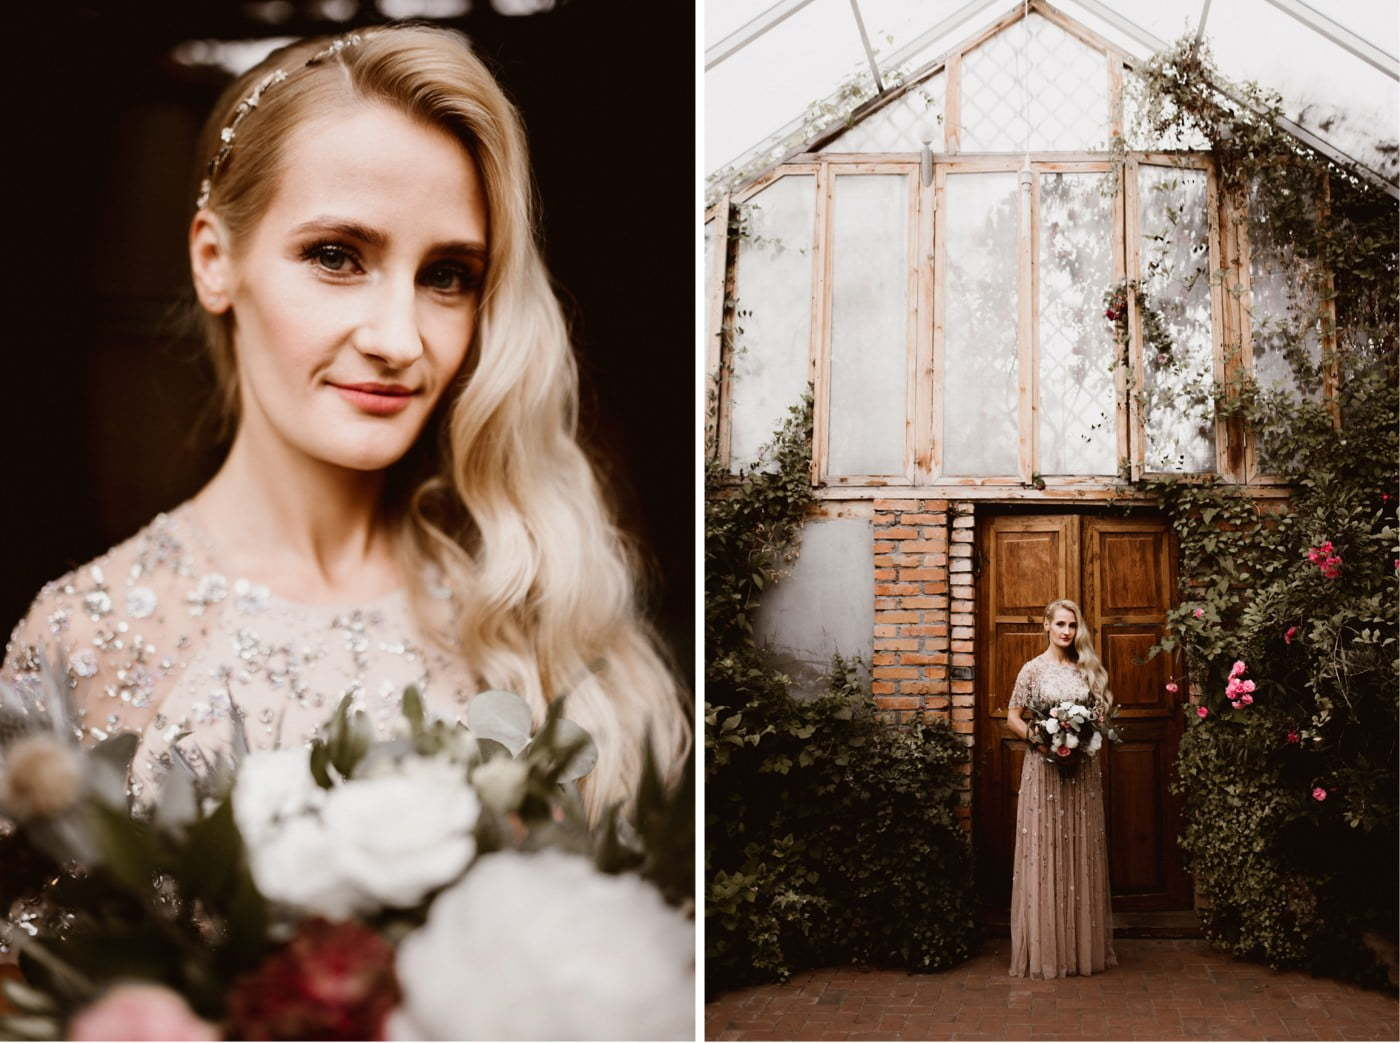 ewelina zieba rustykalne wesele stara oranzeria warszawa 021